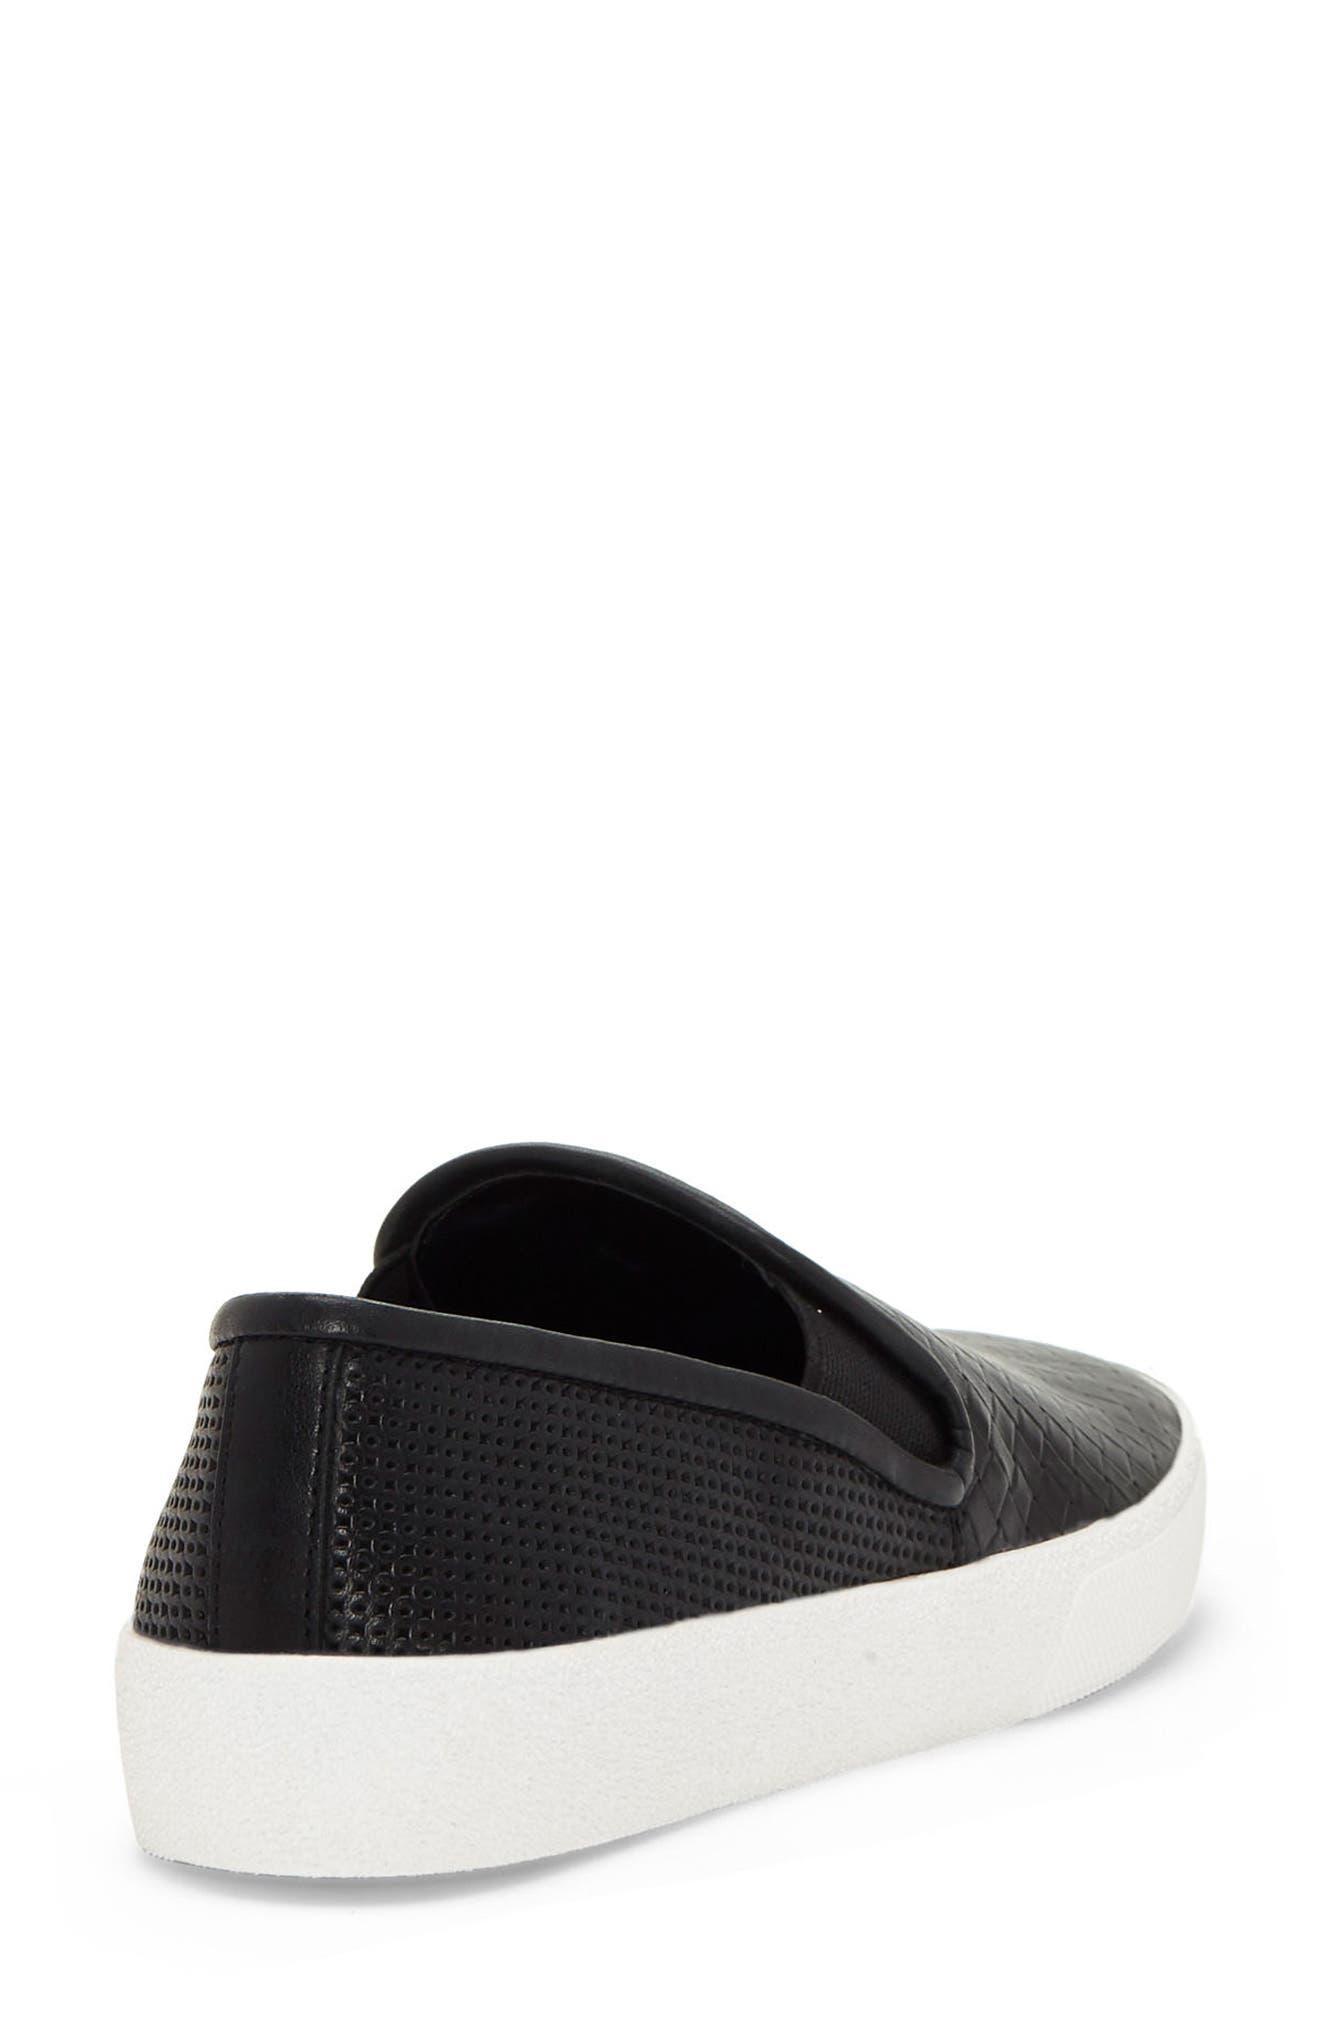 Cariana Slip-On Sneaker,                             Alternate thumbnail 2, color,                             001